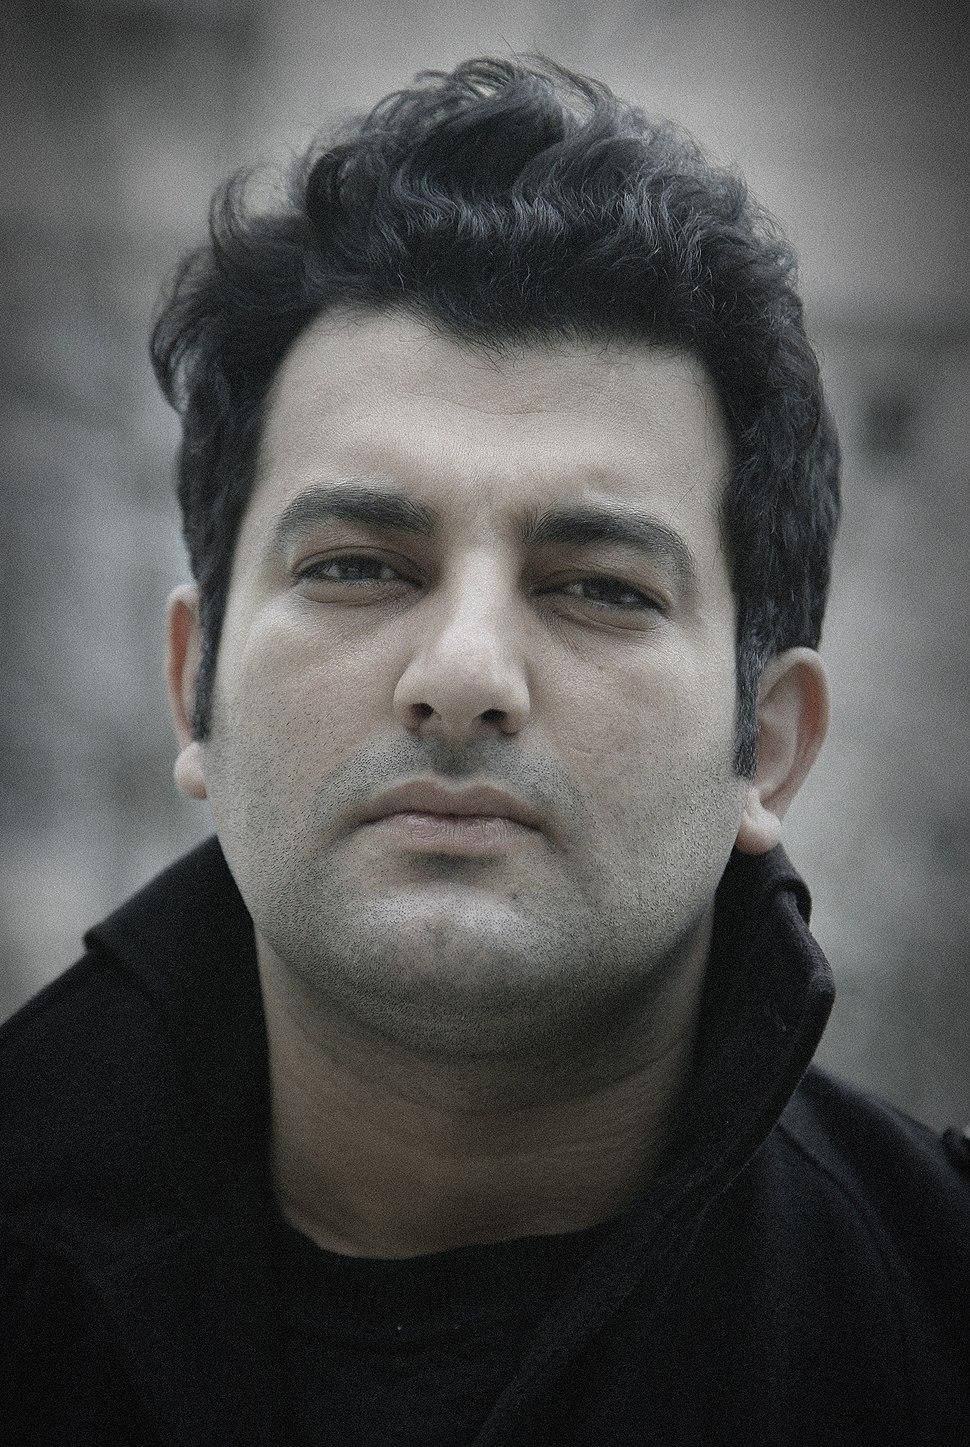 Hossein Rajabian Iranian Filmmaker %26 Photographer